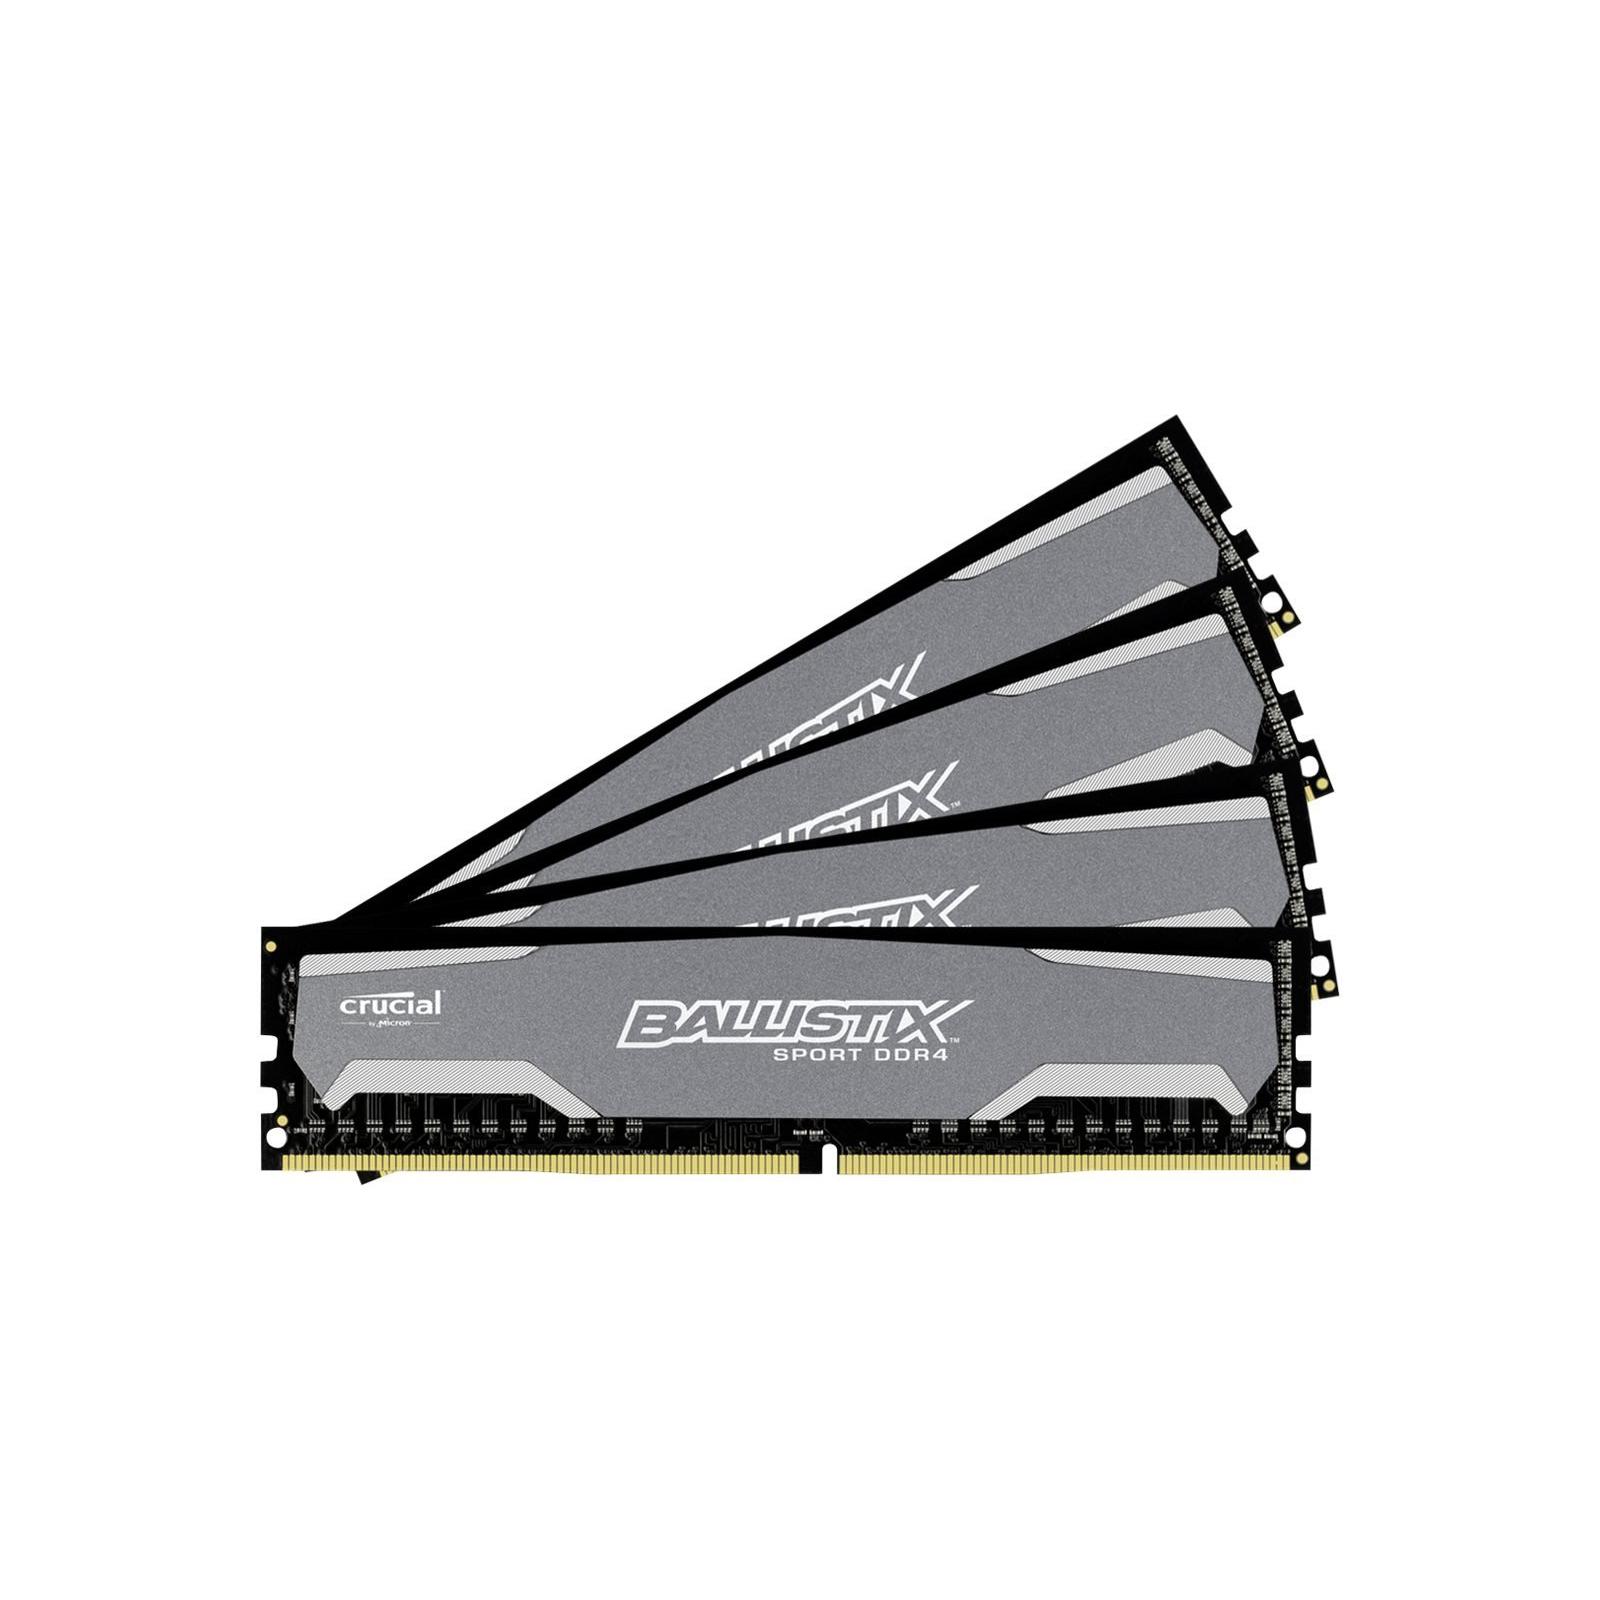 Модуль памяти для компьютера DDR4 32GB (4x8GB) 2400 MHz Ballistix Sport MICRON (BLS4C8G4D240FSA) изображение 2